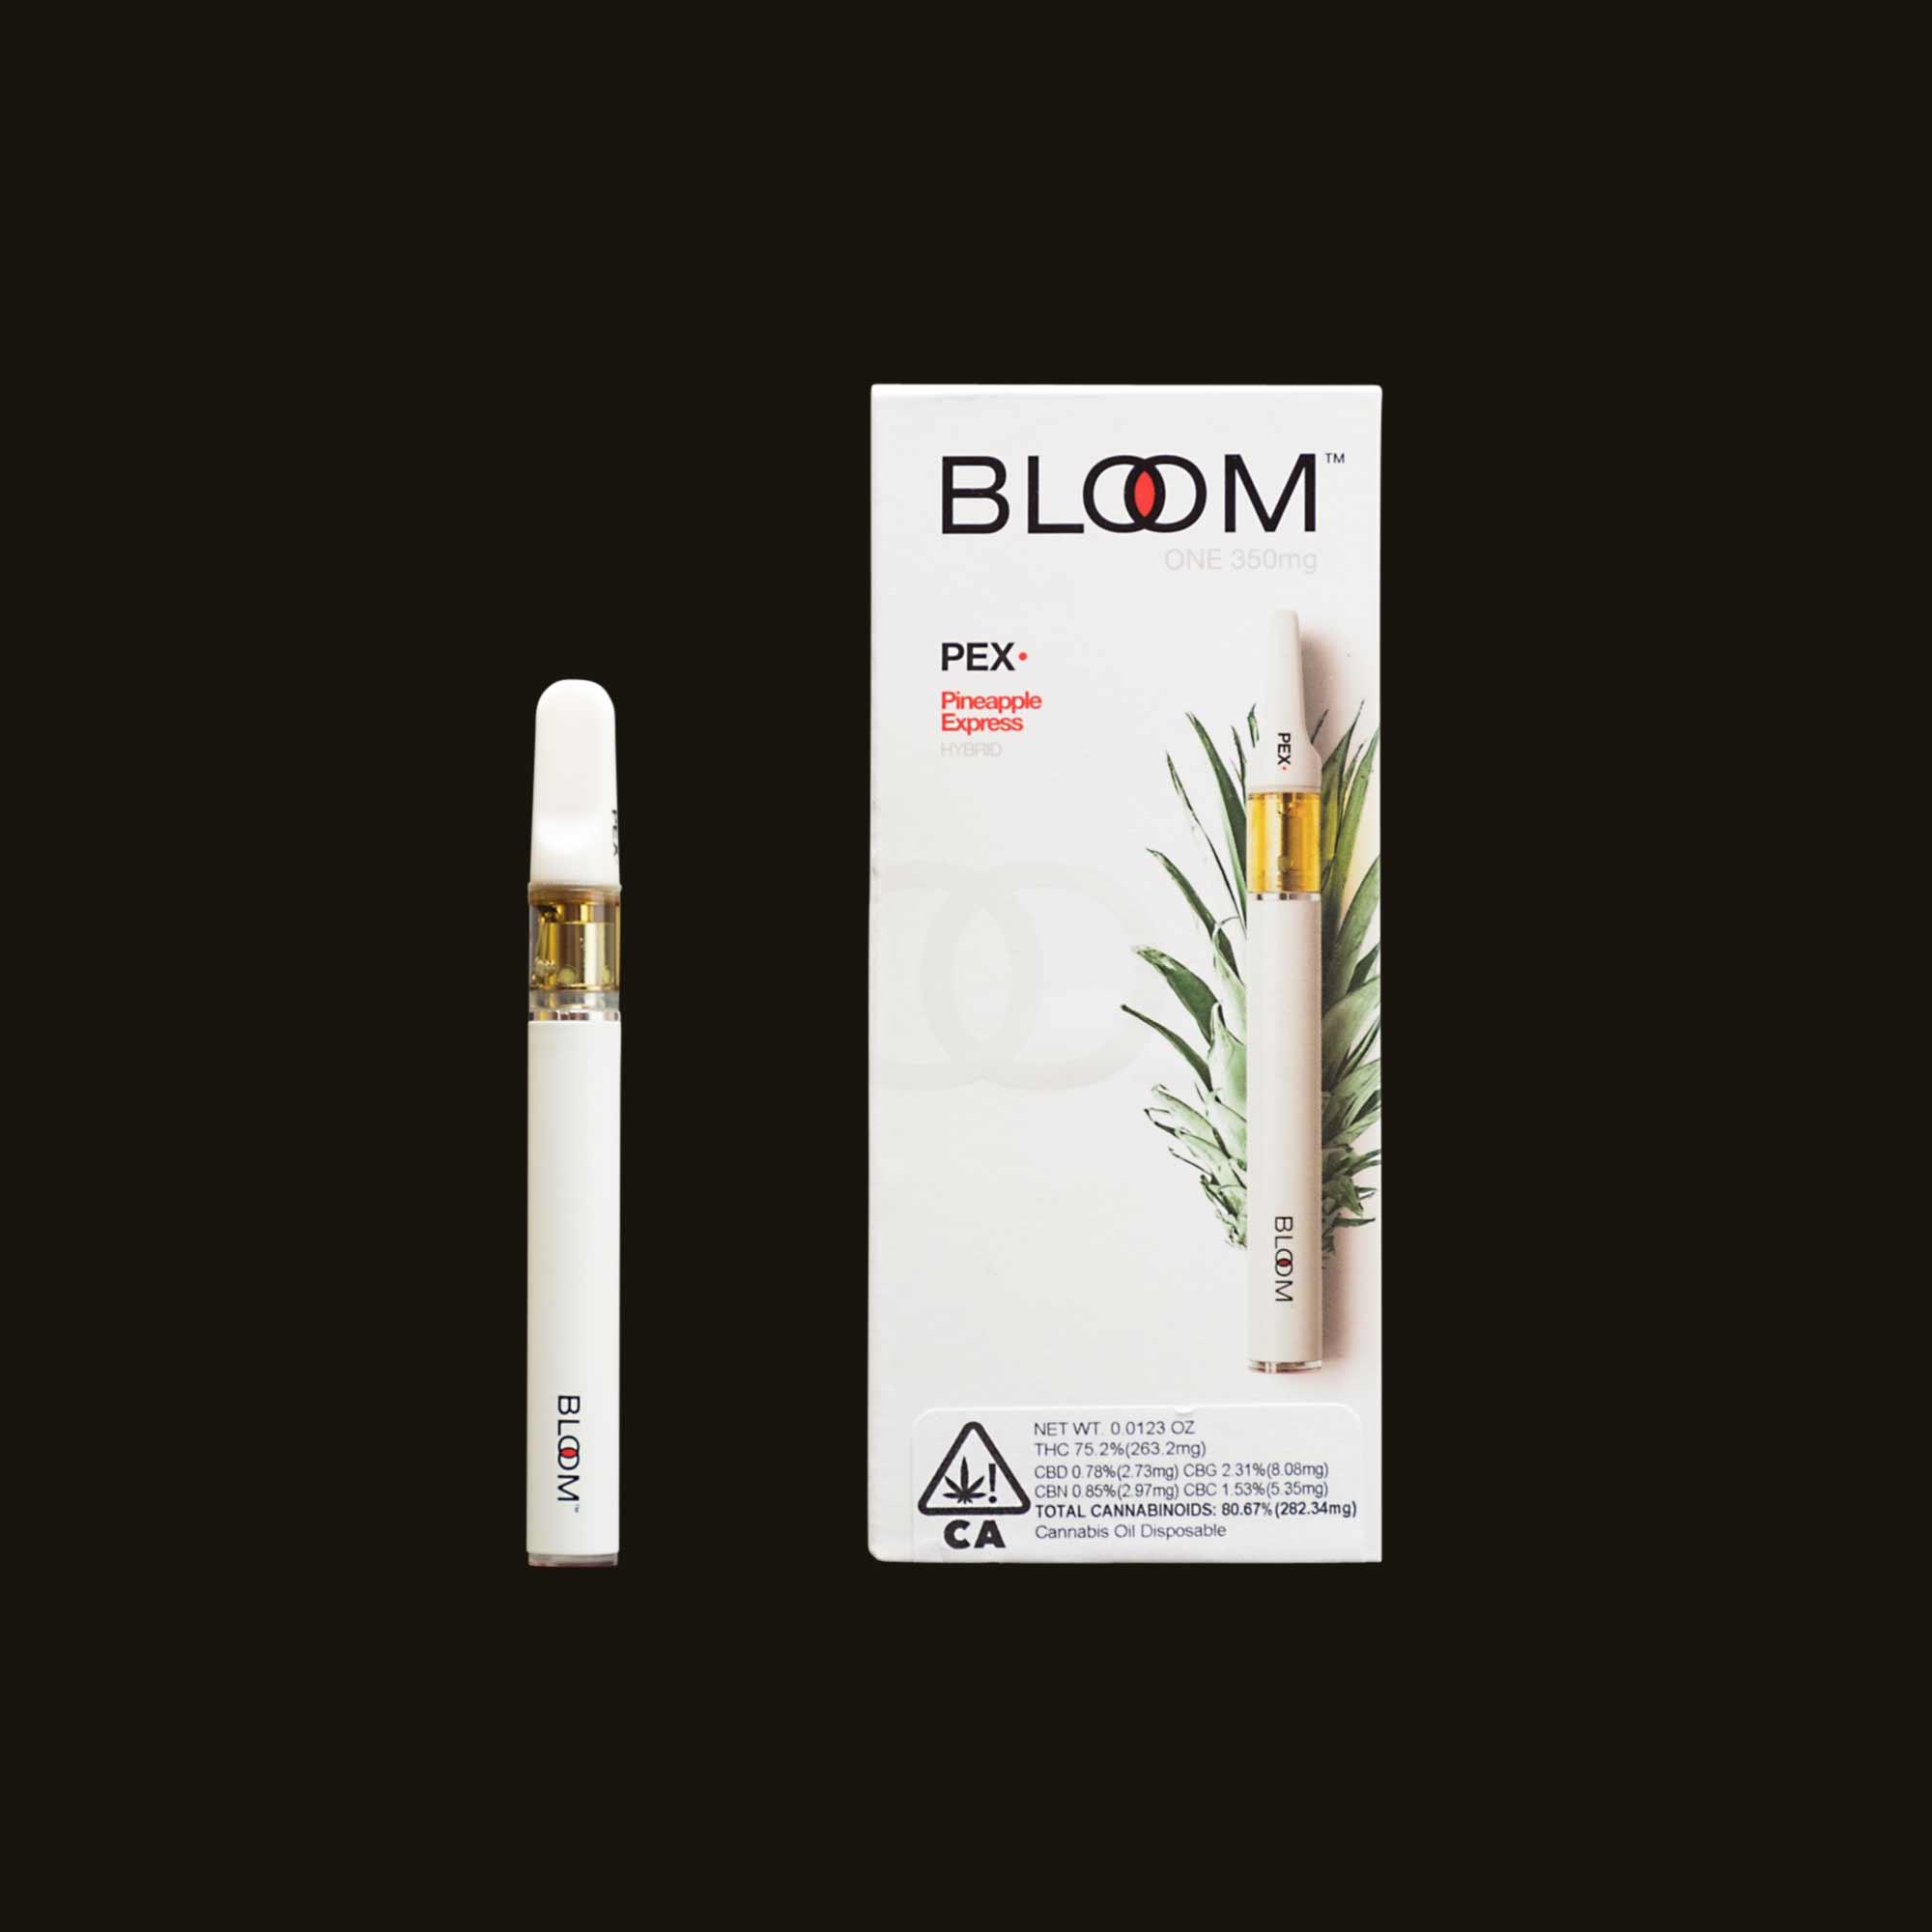 Bloom Brands Pineapple Express Bloom One